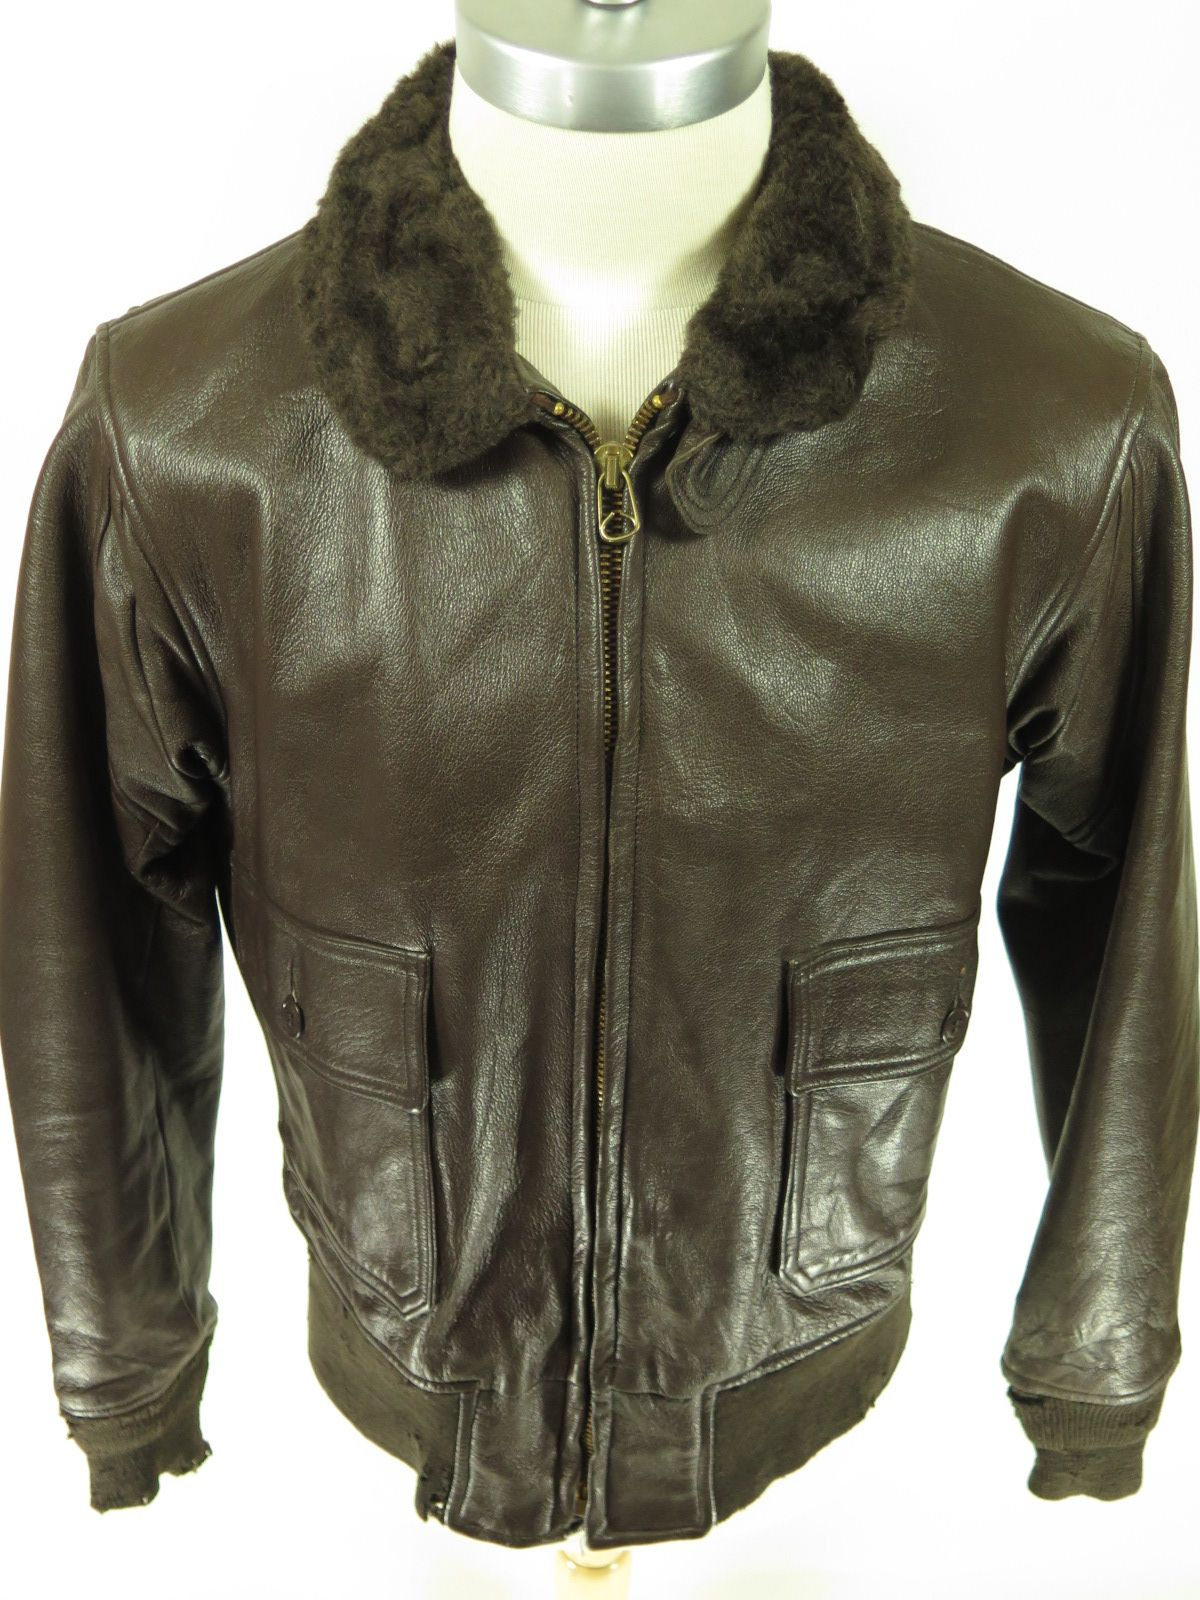 Buy more jacket